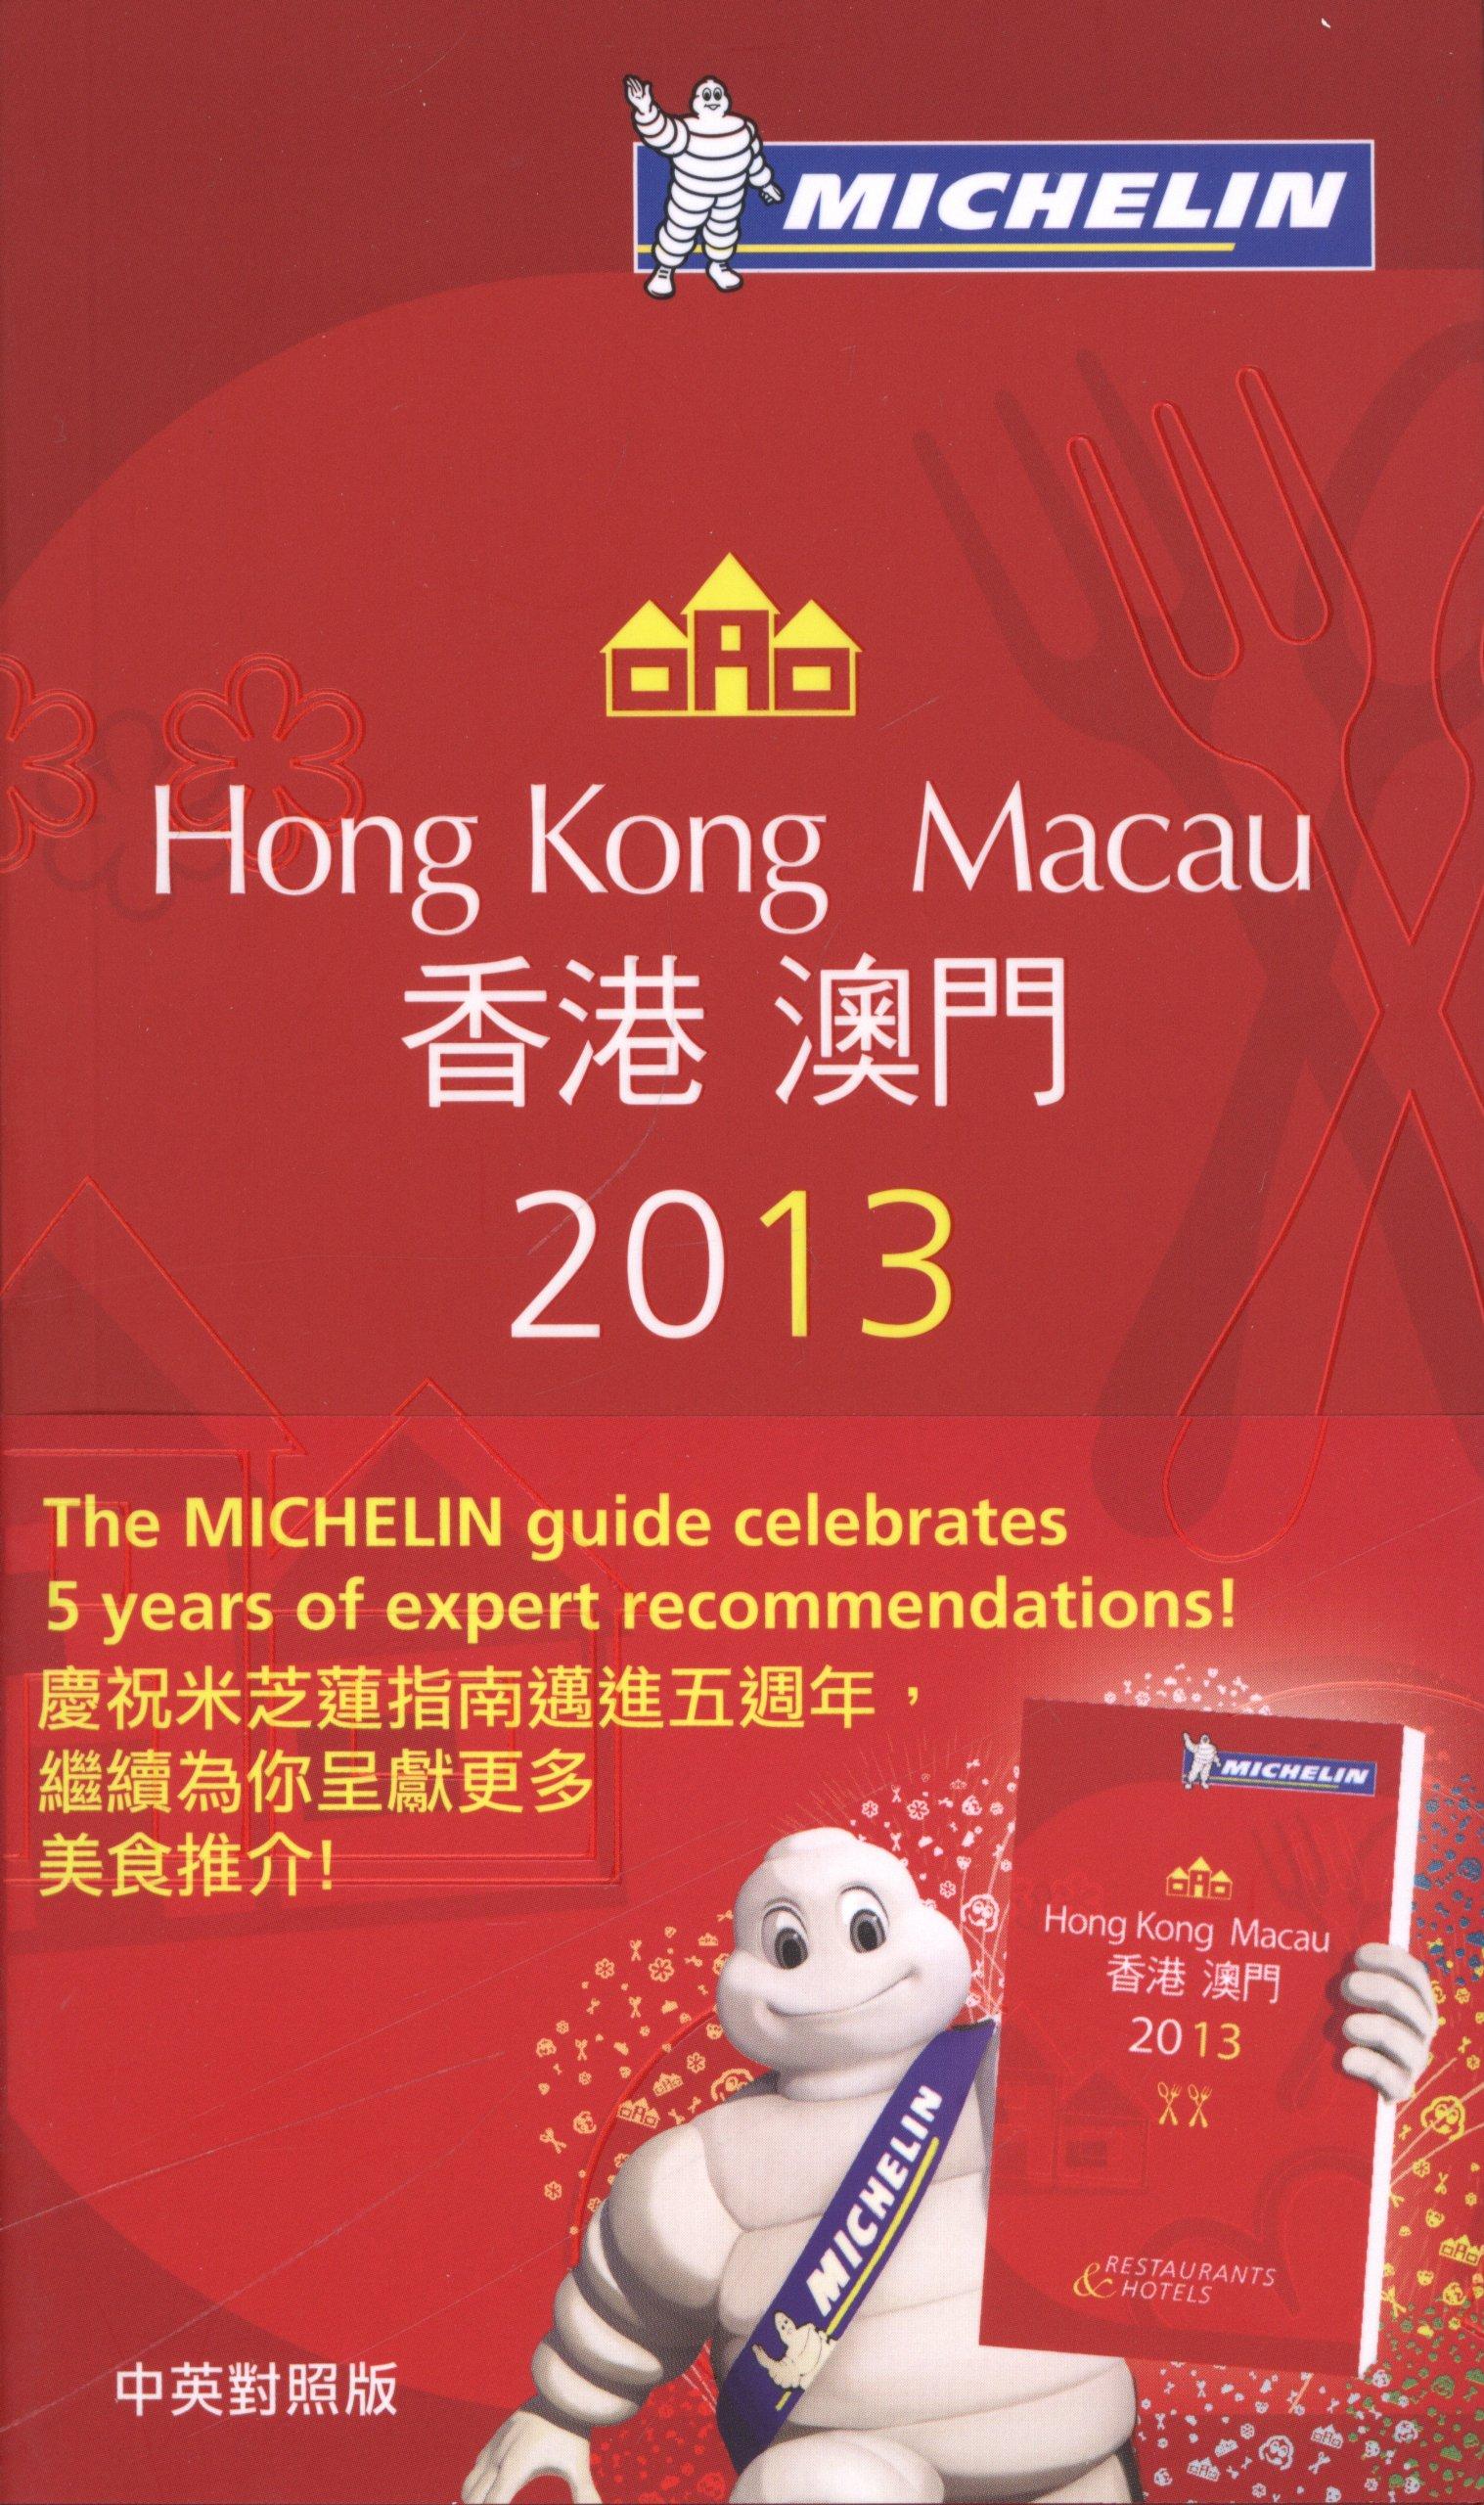 MICHELIN Guide Hong Kong & Macau 2013 (Michelin Guide/Michelin) pdf